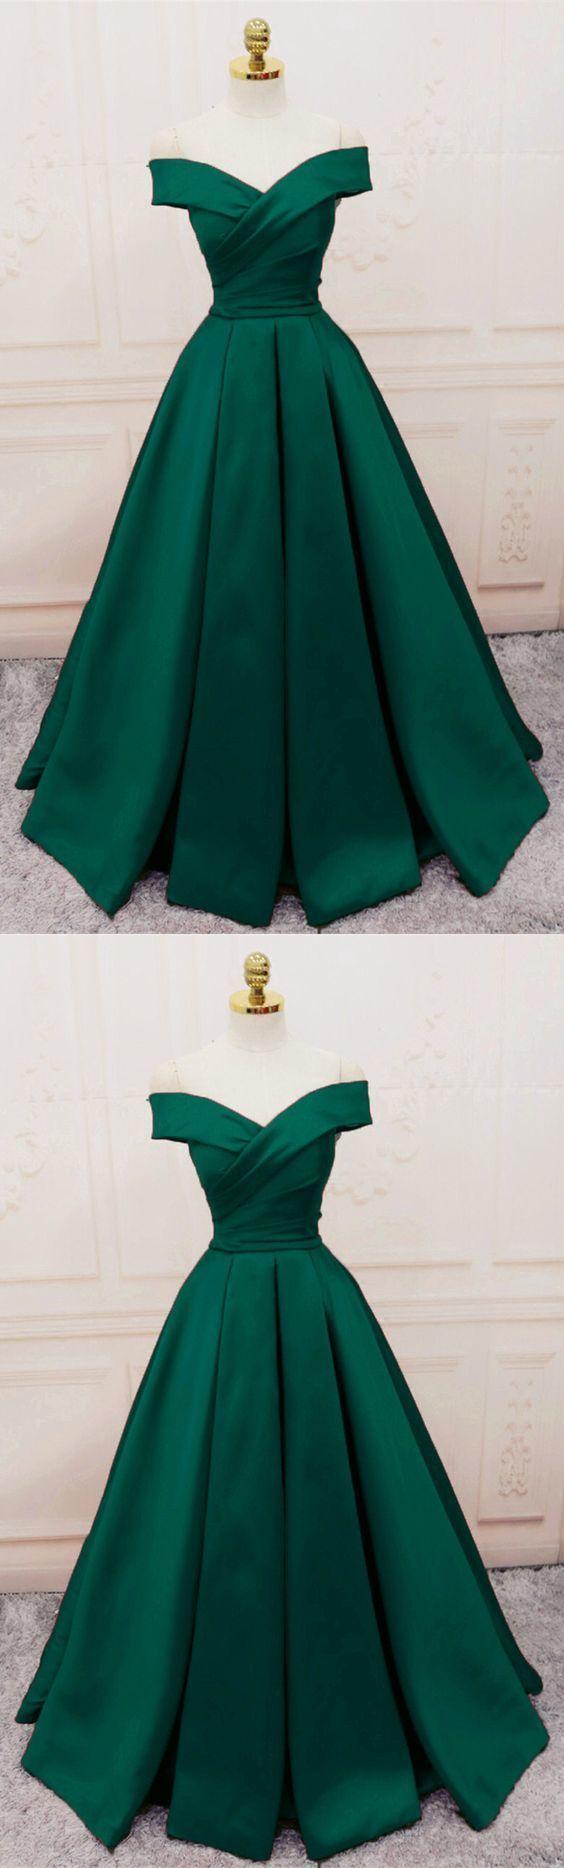 Simple V Neck Off Shoulder Prom Dresses Long Evening Gowns Green Prom Dress Satin Evening Dresses Satin Evening Gown